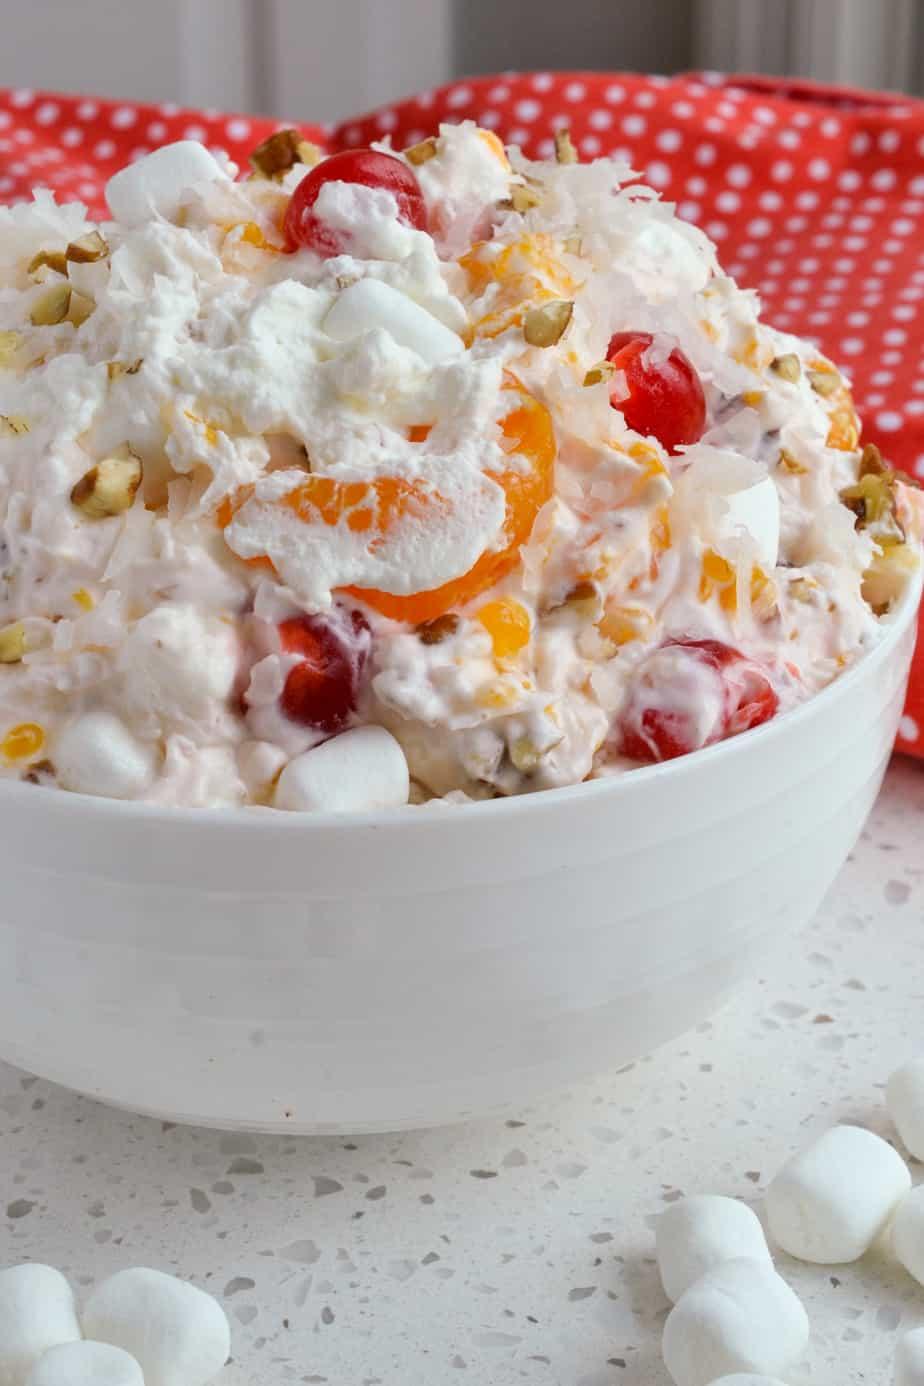 Creamy Ambrosia Salad with cherries, mandarin oranges, and pineapple.